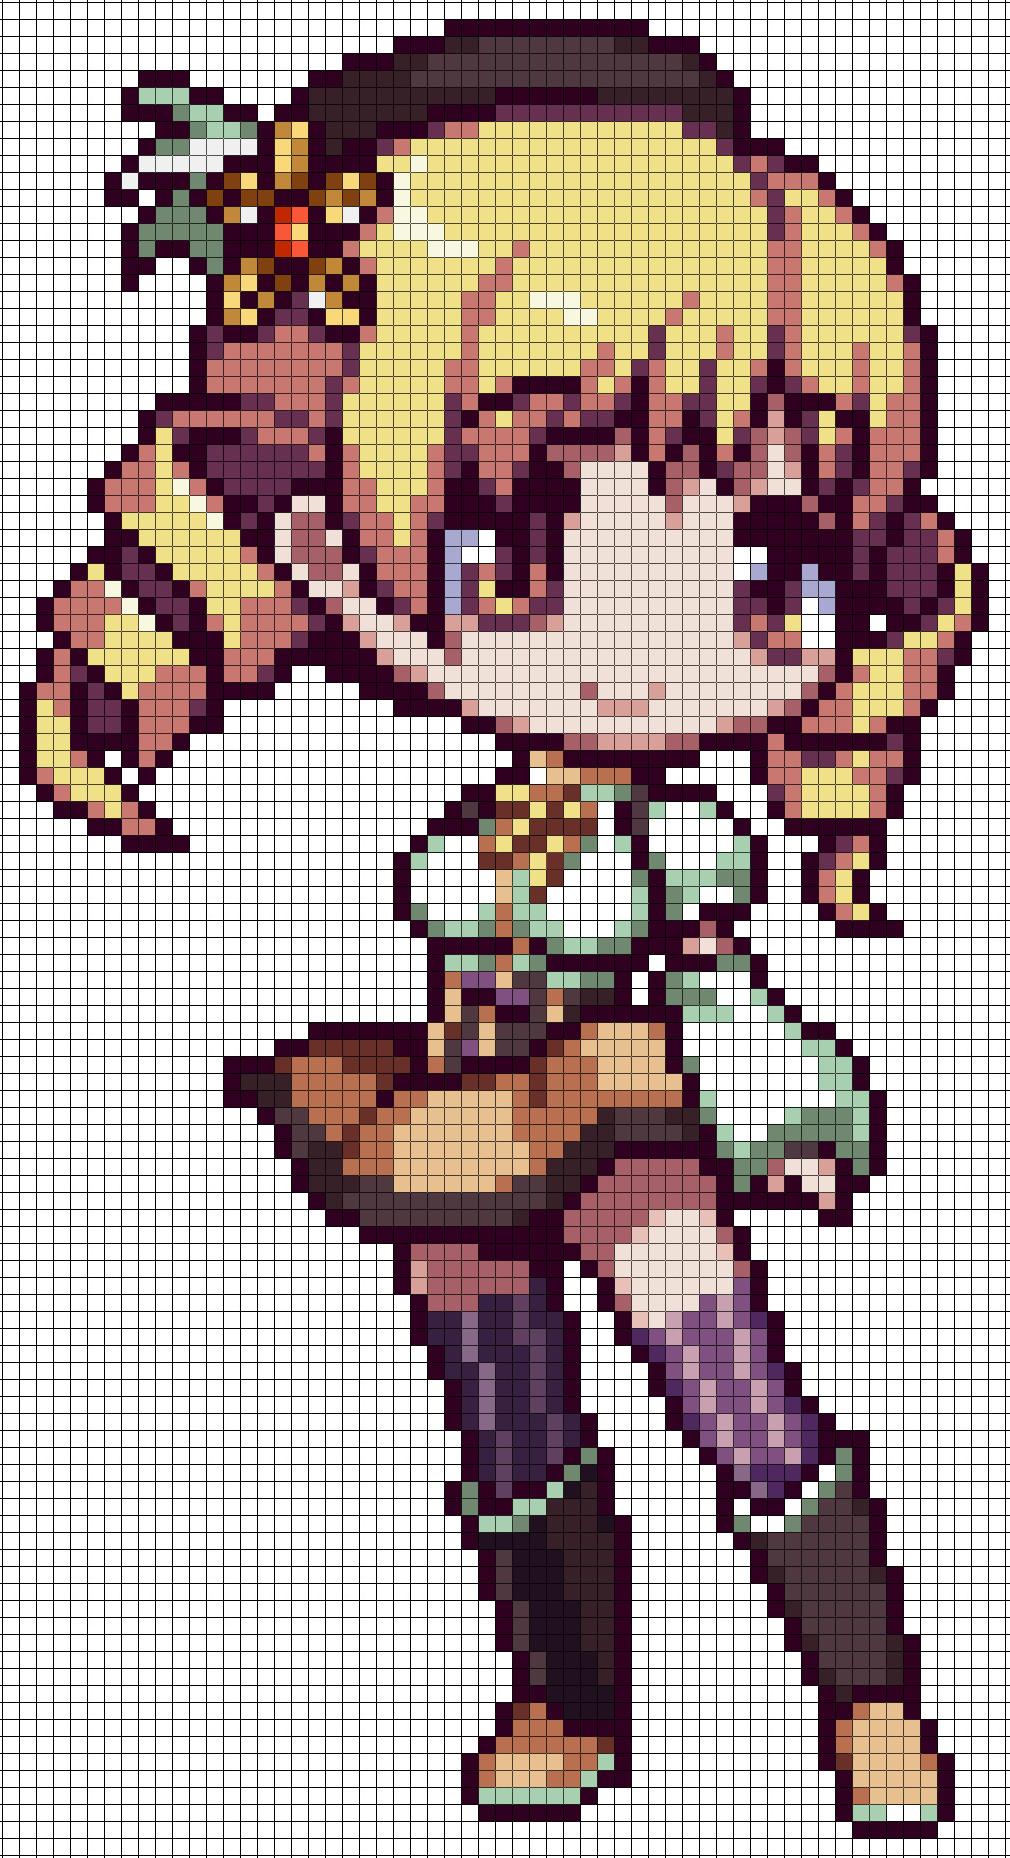 Anime Pixel Art Grid Tutorials On Perler Beads Deviantart